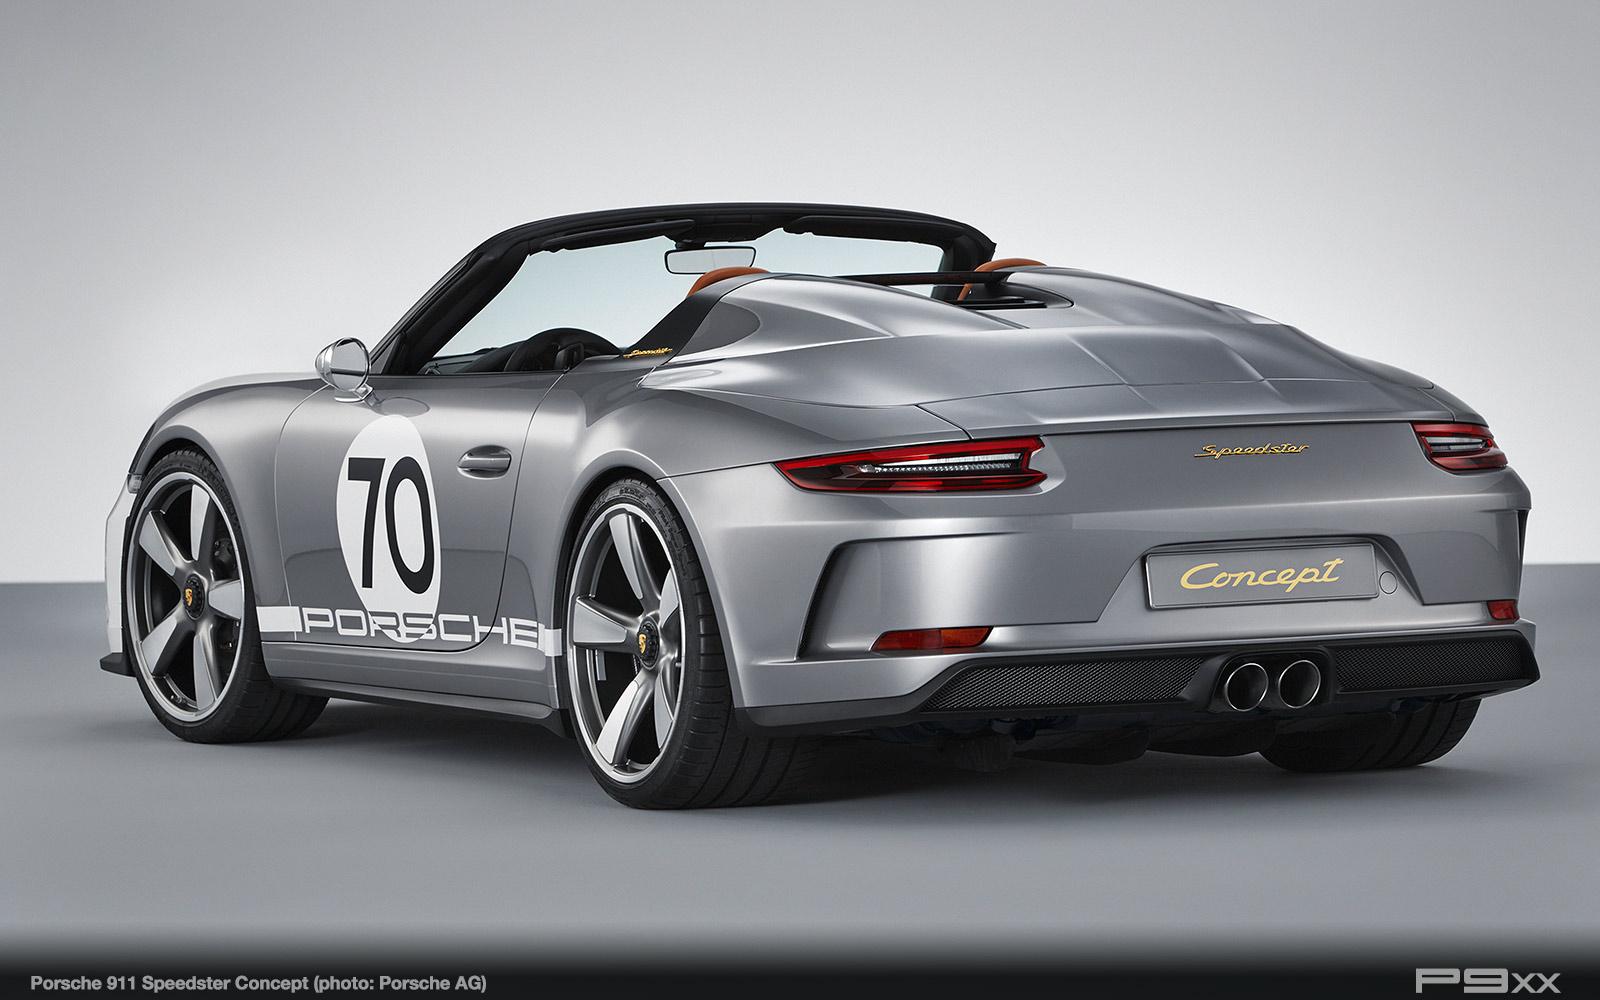 Porsche-911-Speedster-Concept-2018-302